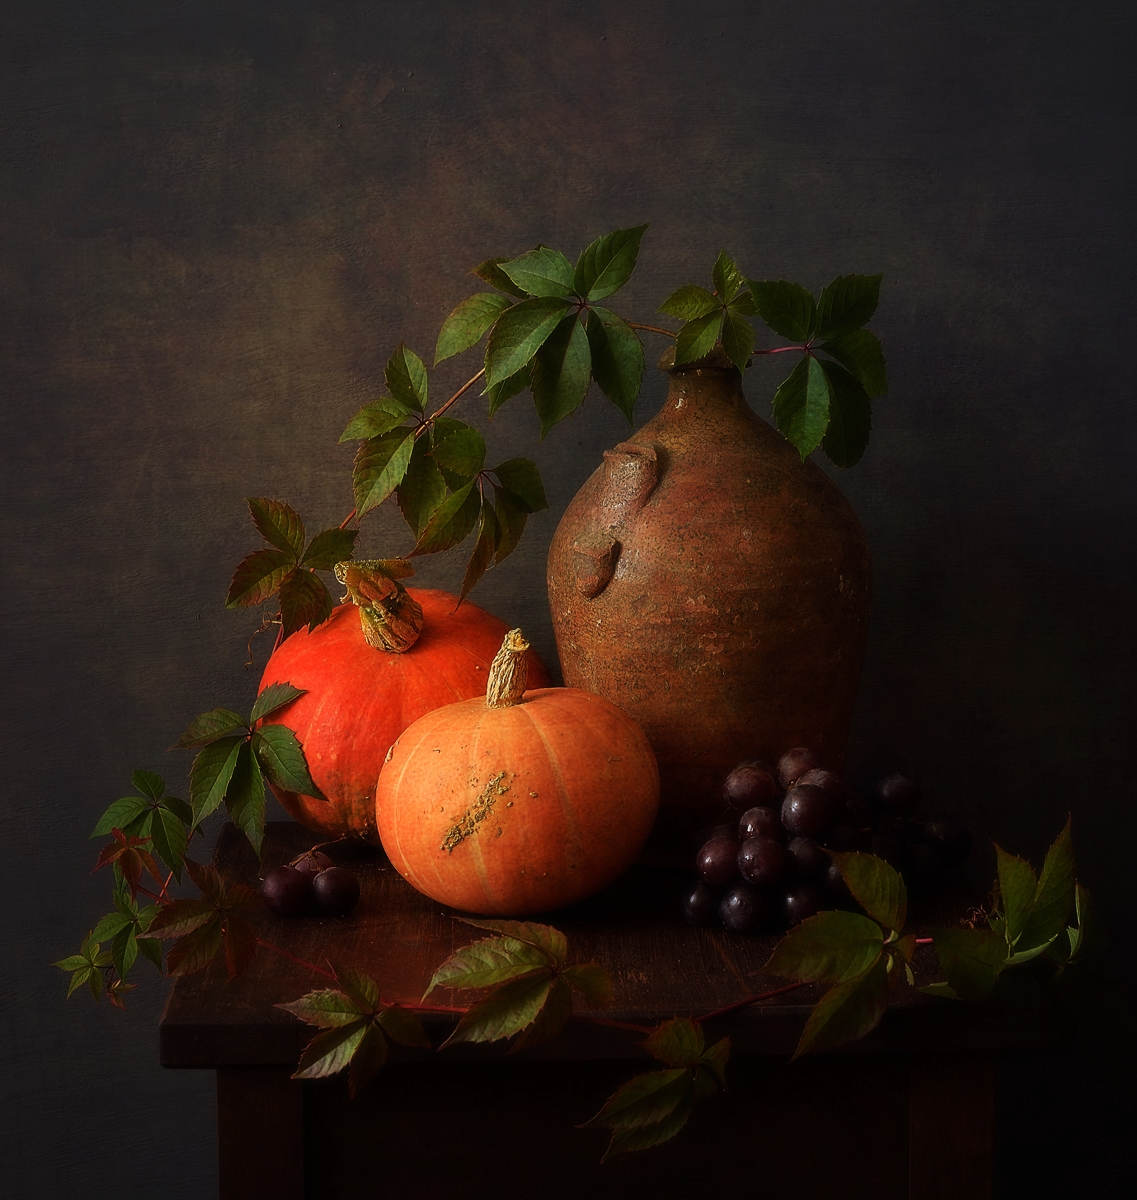 натюрморт,композиция,тыквы,виноград,осень, Наталия К